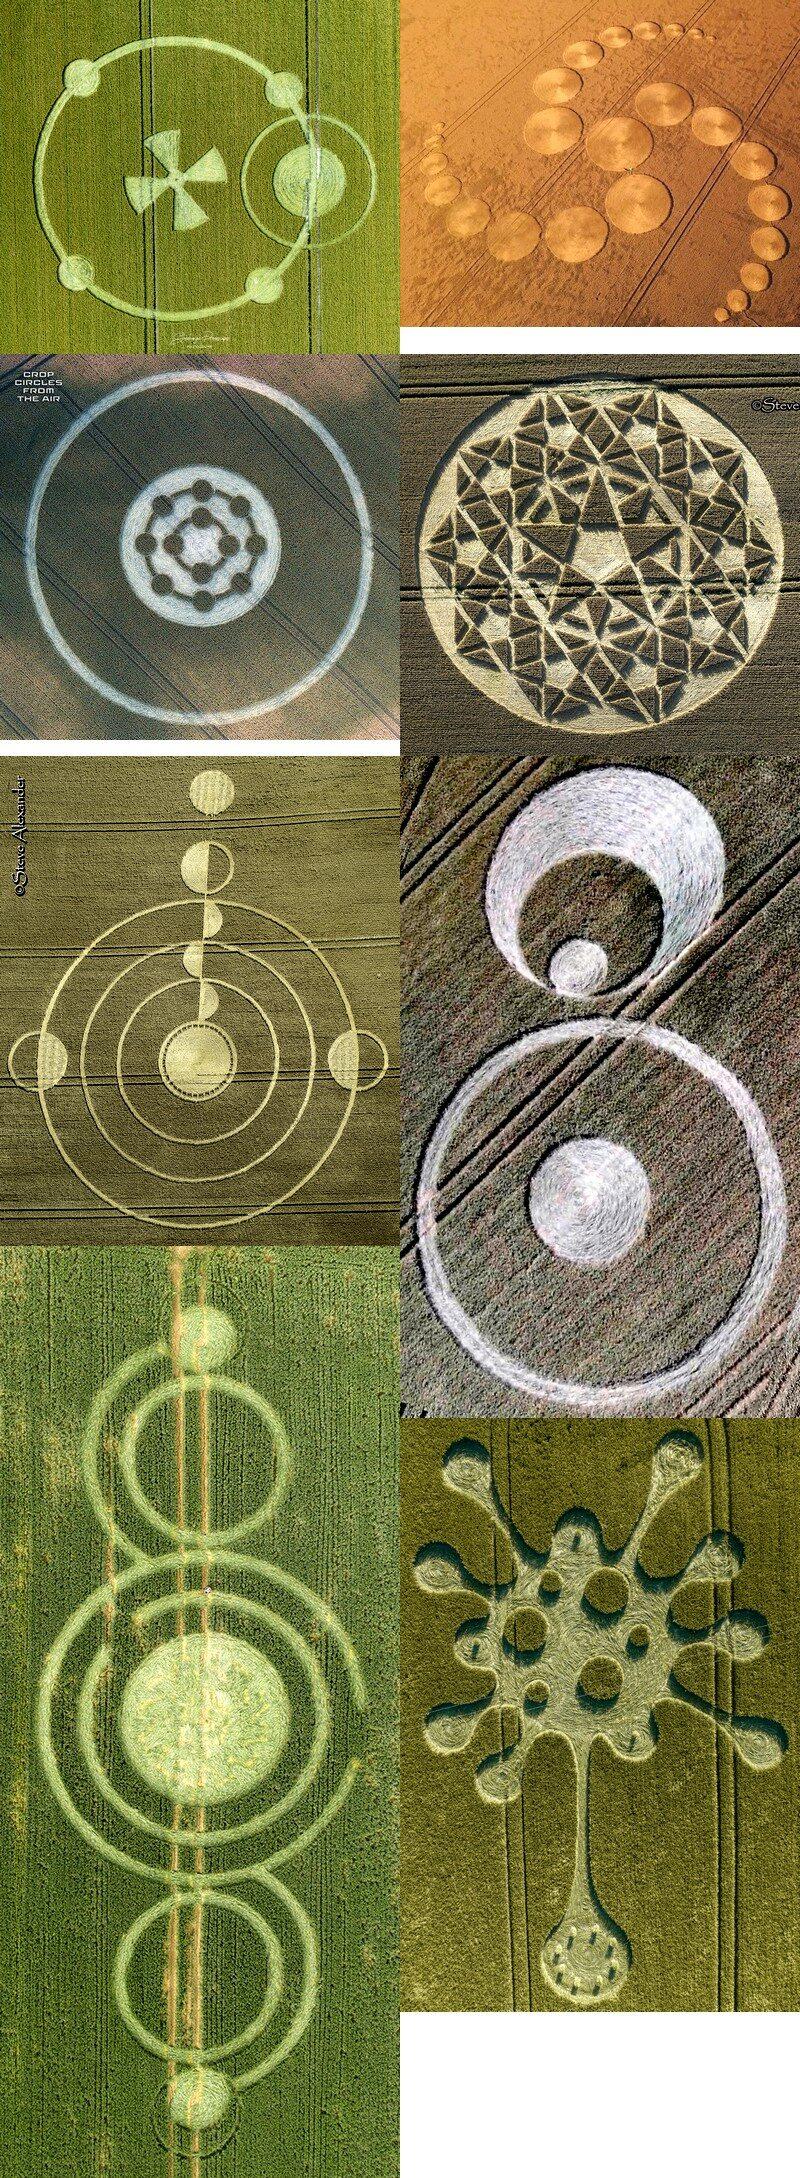 crop circles 2020 - Page 2 2020b10